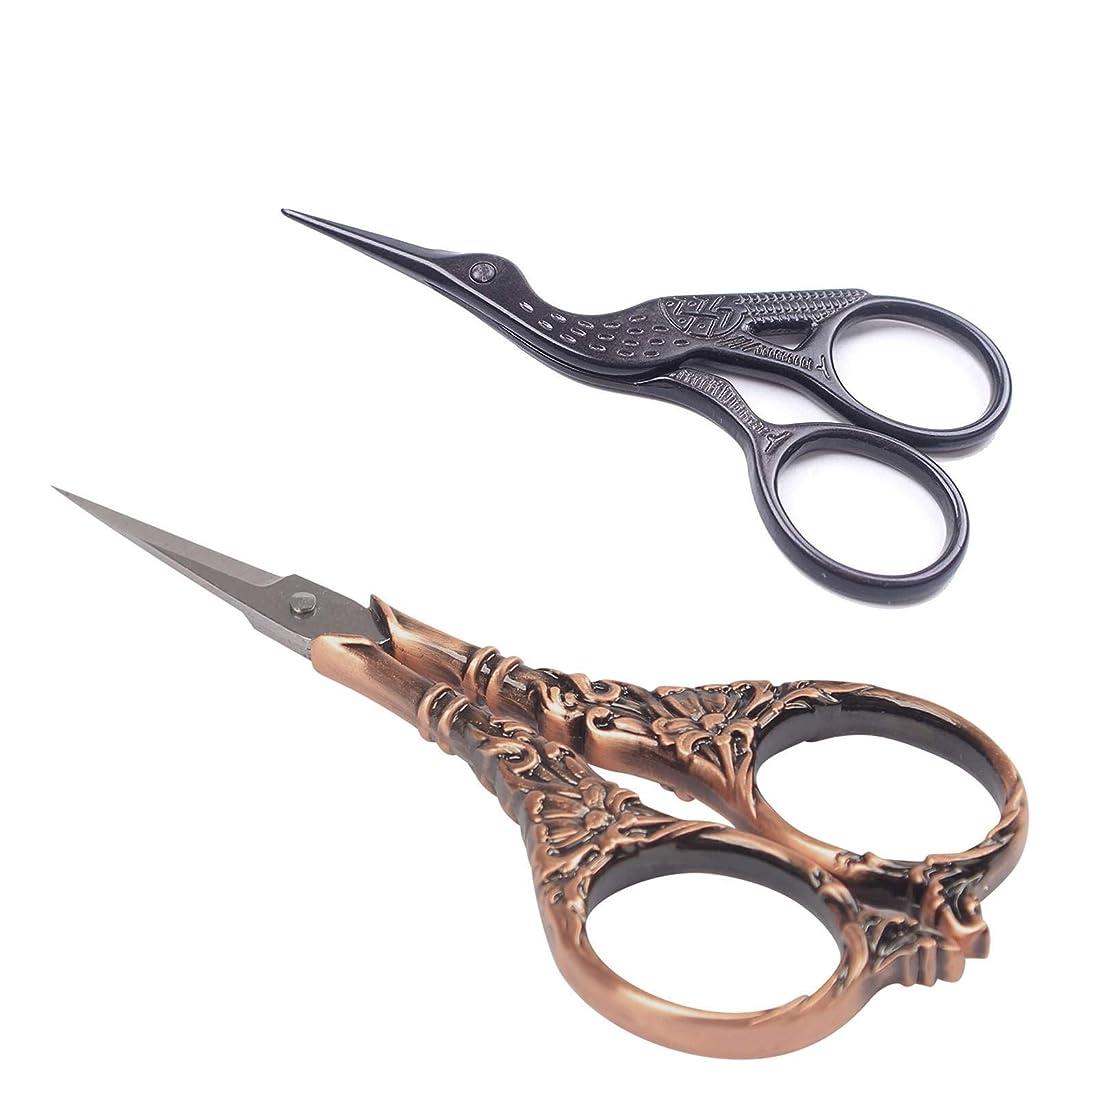 BIHRTC 2 Pairs Scissors Vintage European Style Flower Pattern Scissors Stainless Steel Sharp Tip Stork Scissors Needlework Embroidery Scissors Tailor Craft Sewing Scissors (4.5